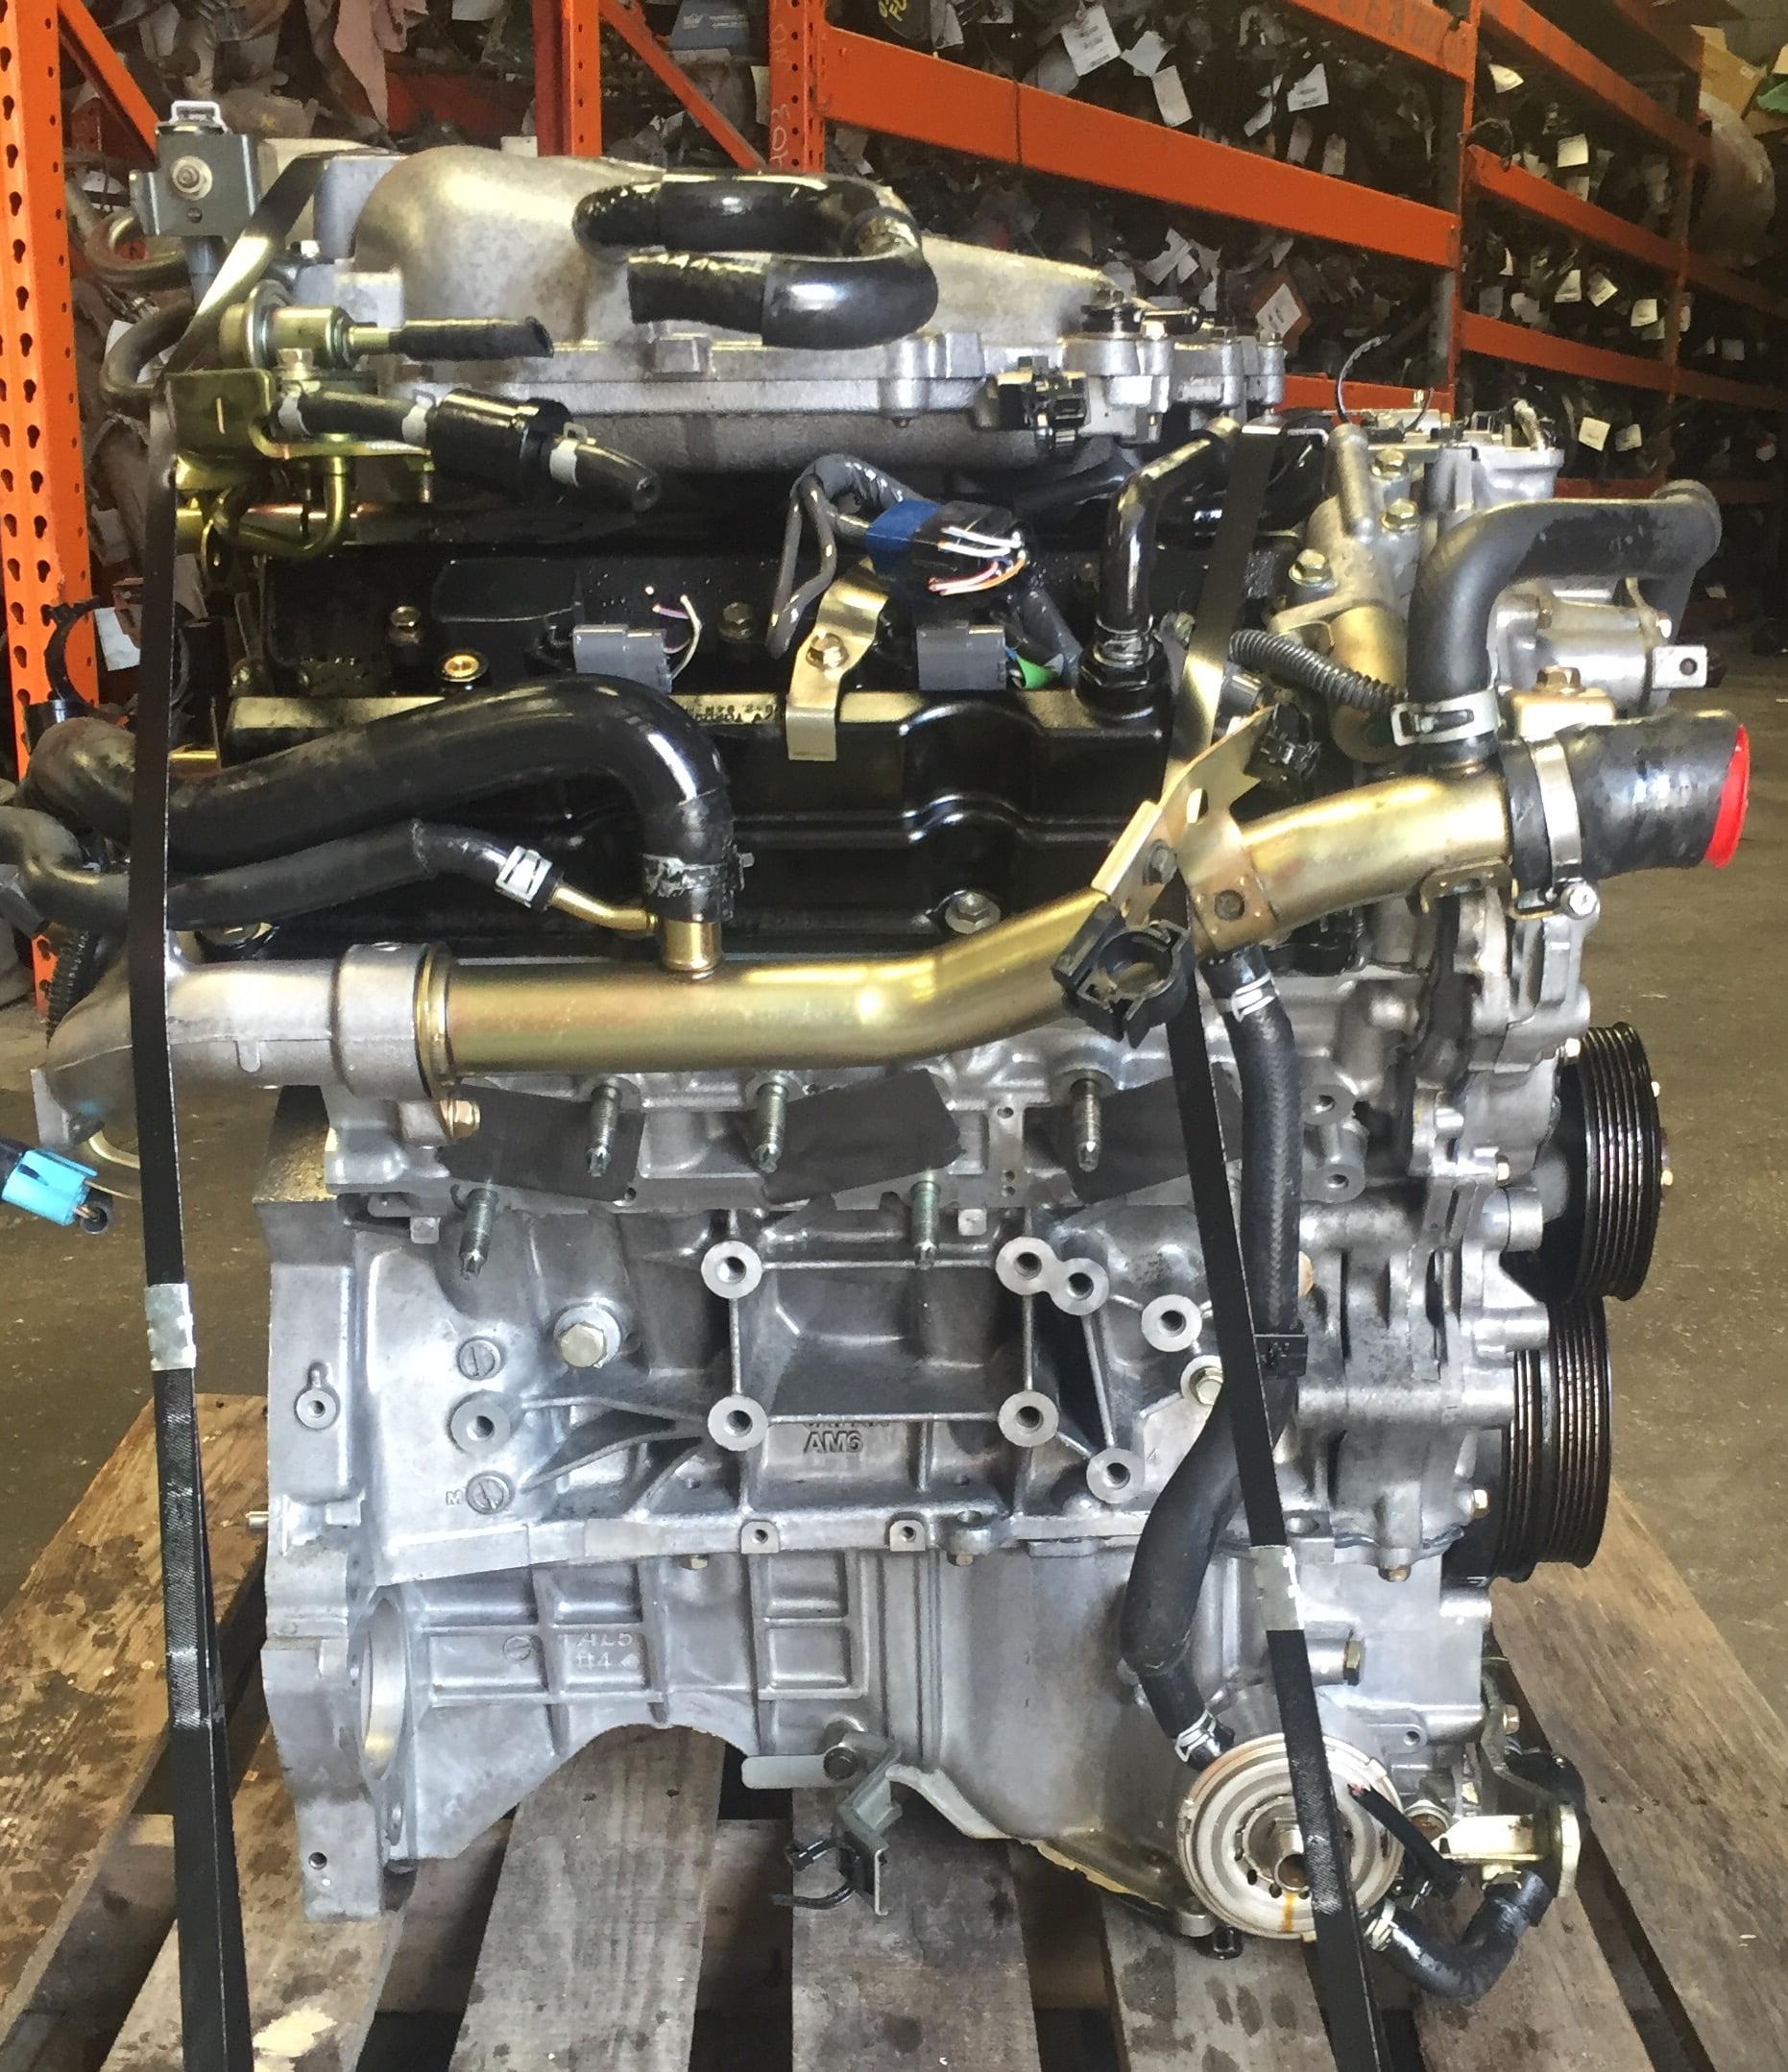 3 4l V6 Engine Gm Heater Core Hose Diagram Infinity G35 Fx35 M35 Engine 3 5l 2004 2005 2006 2007 A